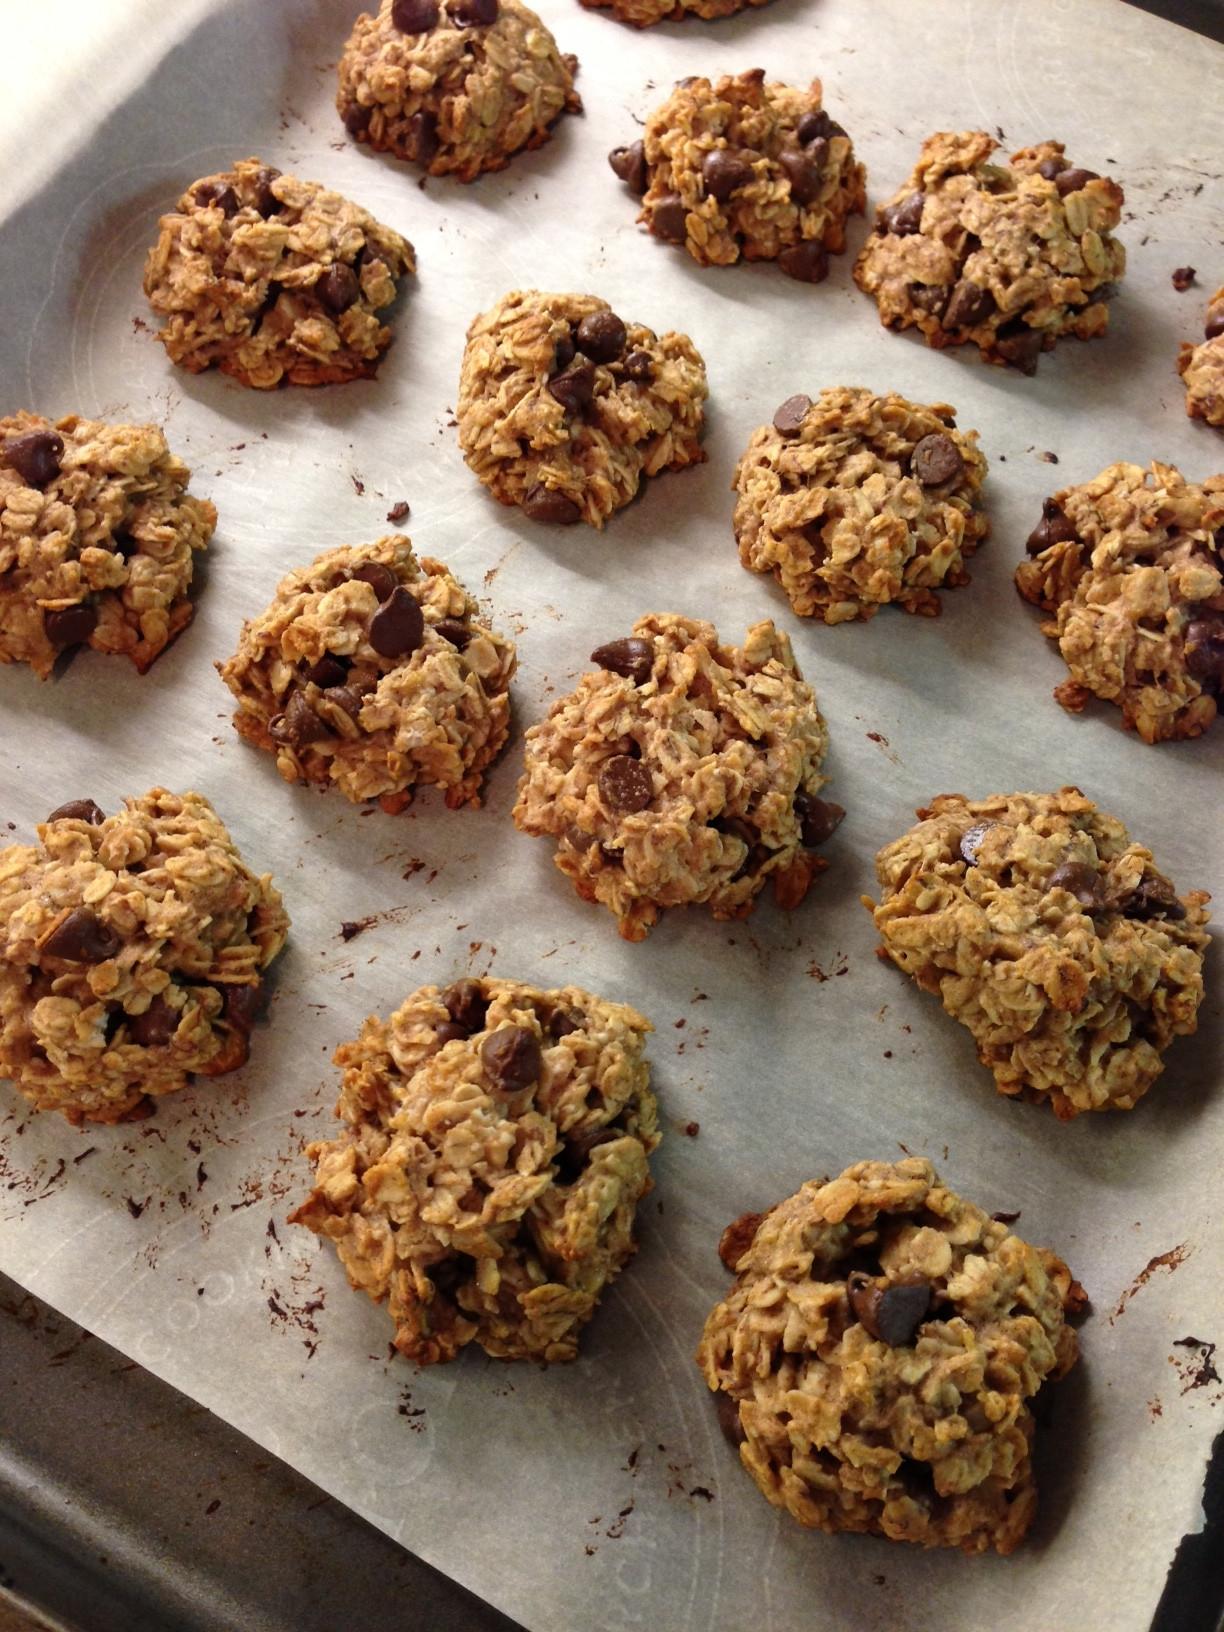 Healthy Oatmeal Choc Chip Cookies  Healthy Oatmeal Chocolate Chip Cookies Lauren Follett